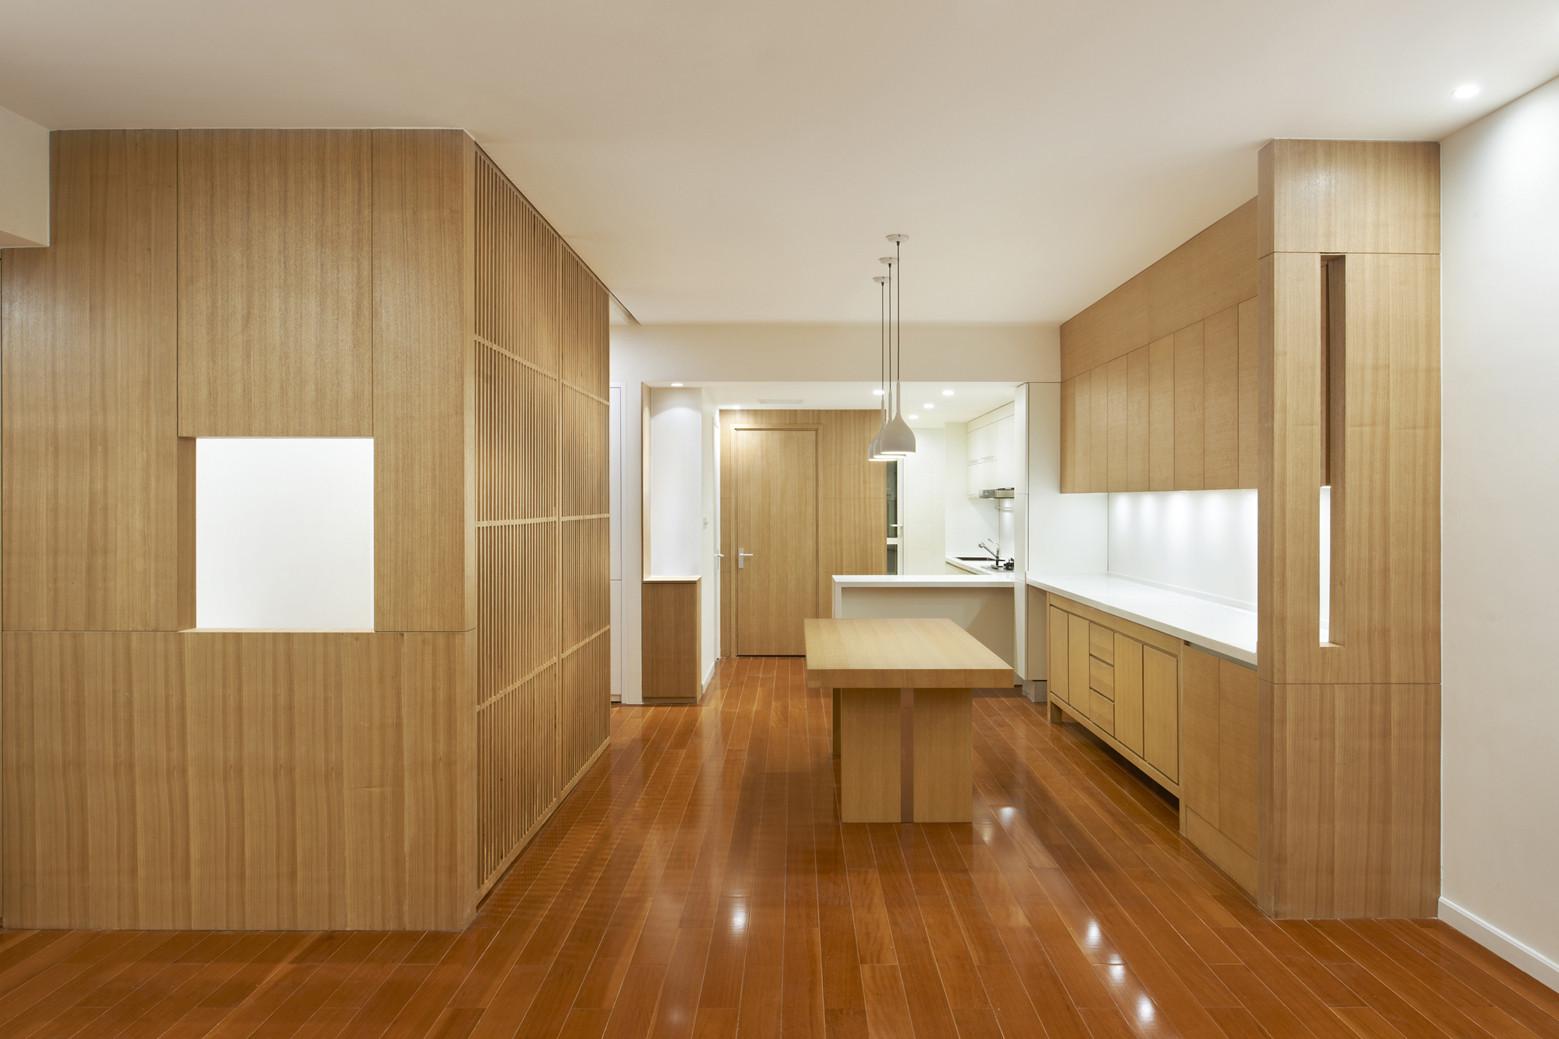 House in Dawanglu / Tsutsumi & Associates, © Misae Hiromatsu